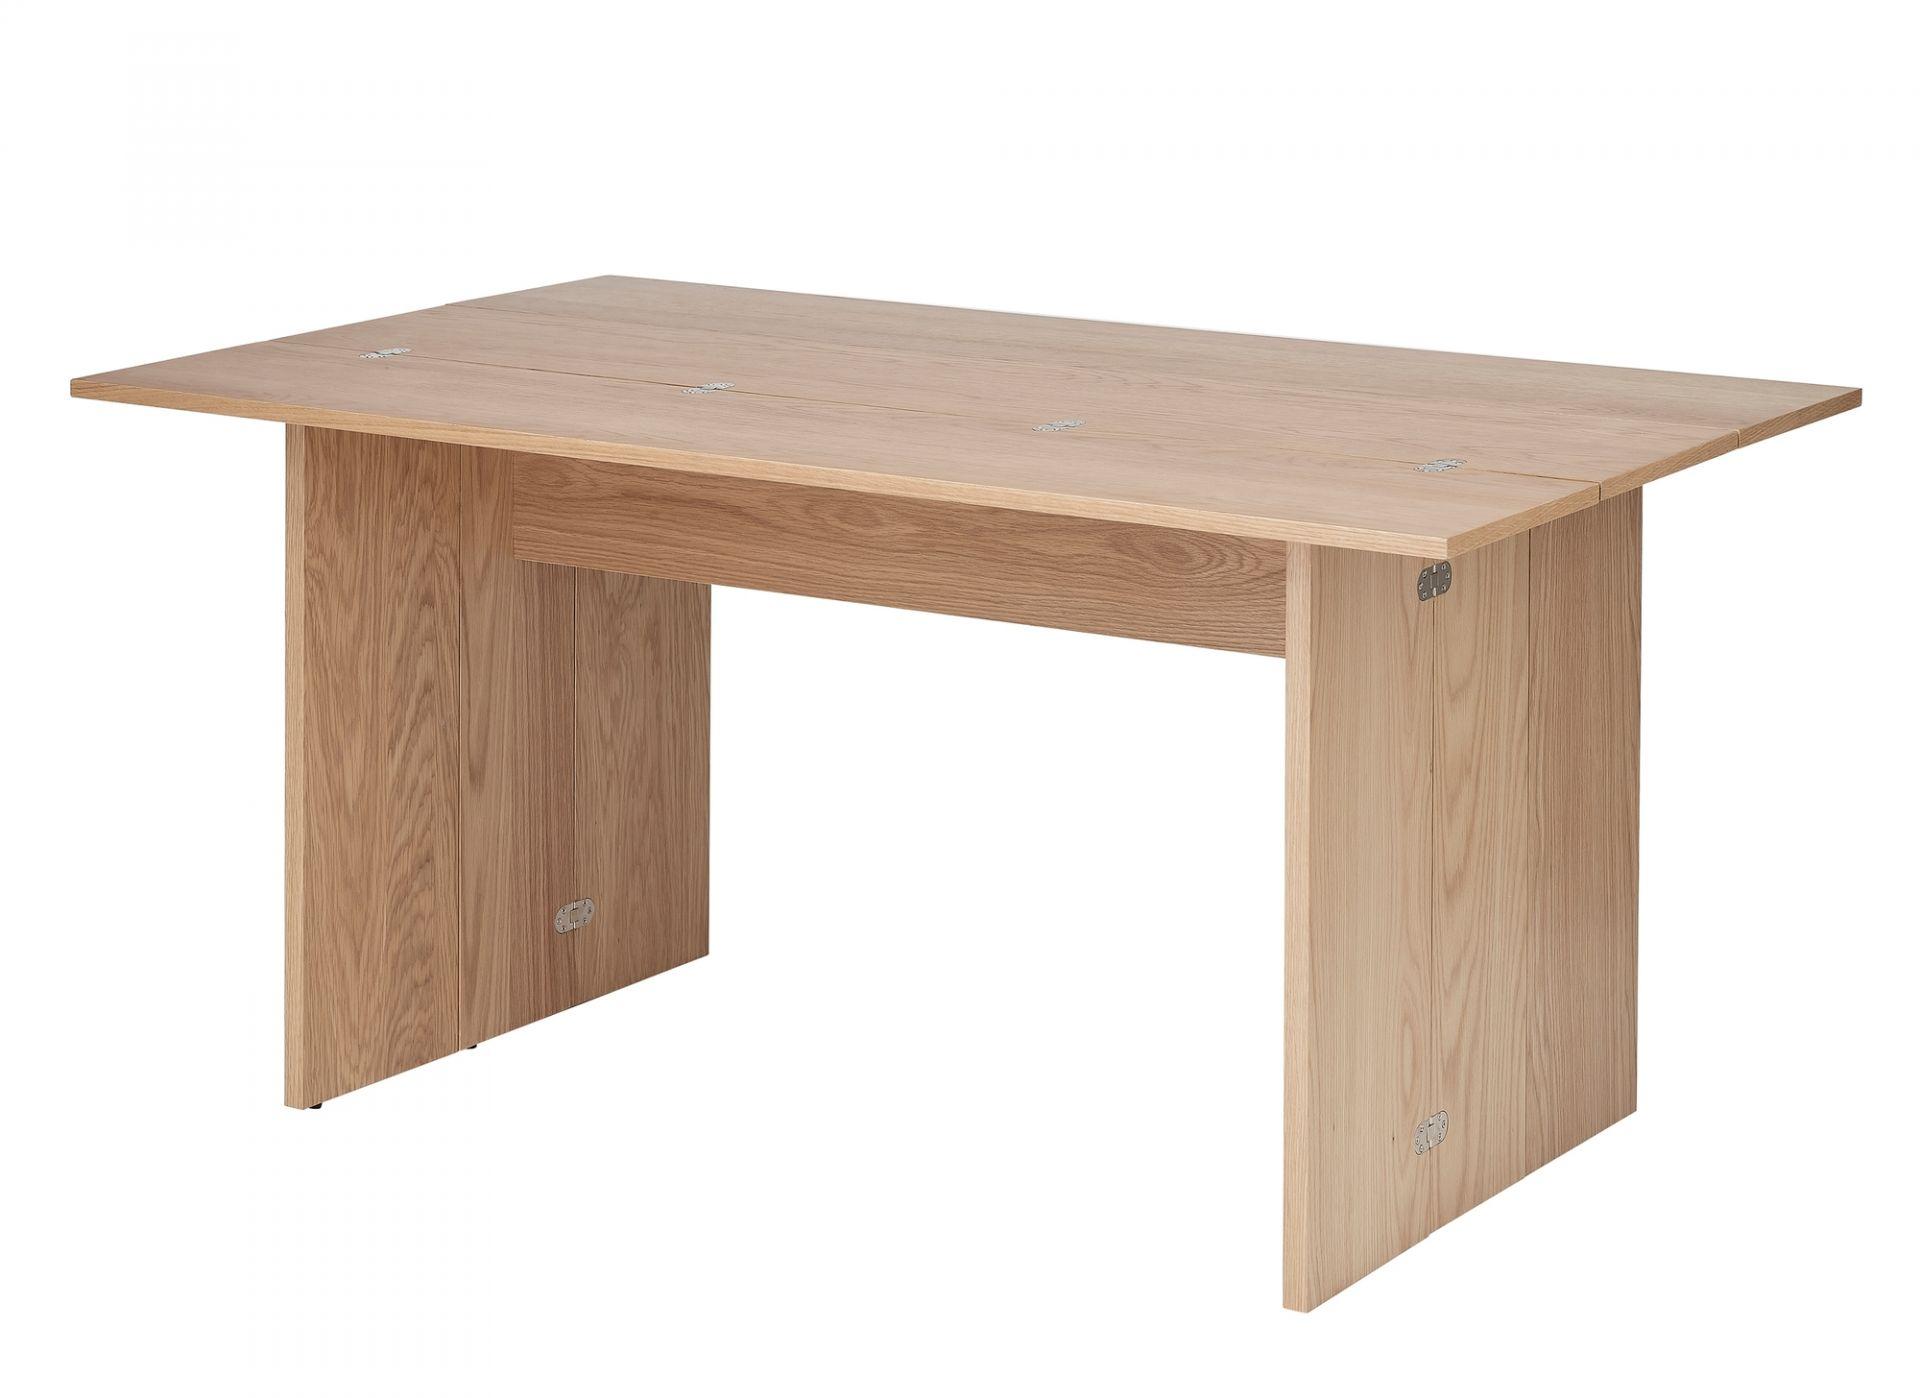 Flip Table Tisch Design House Stockholm Eiche lackiert